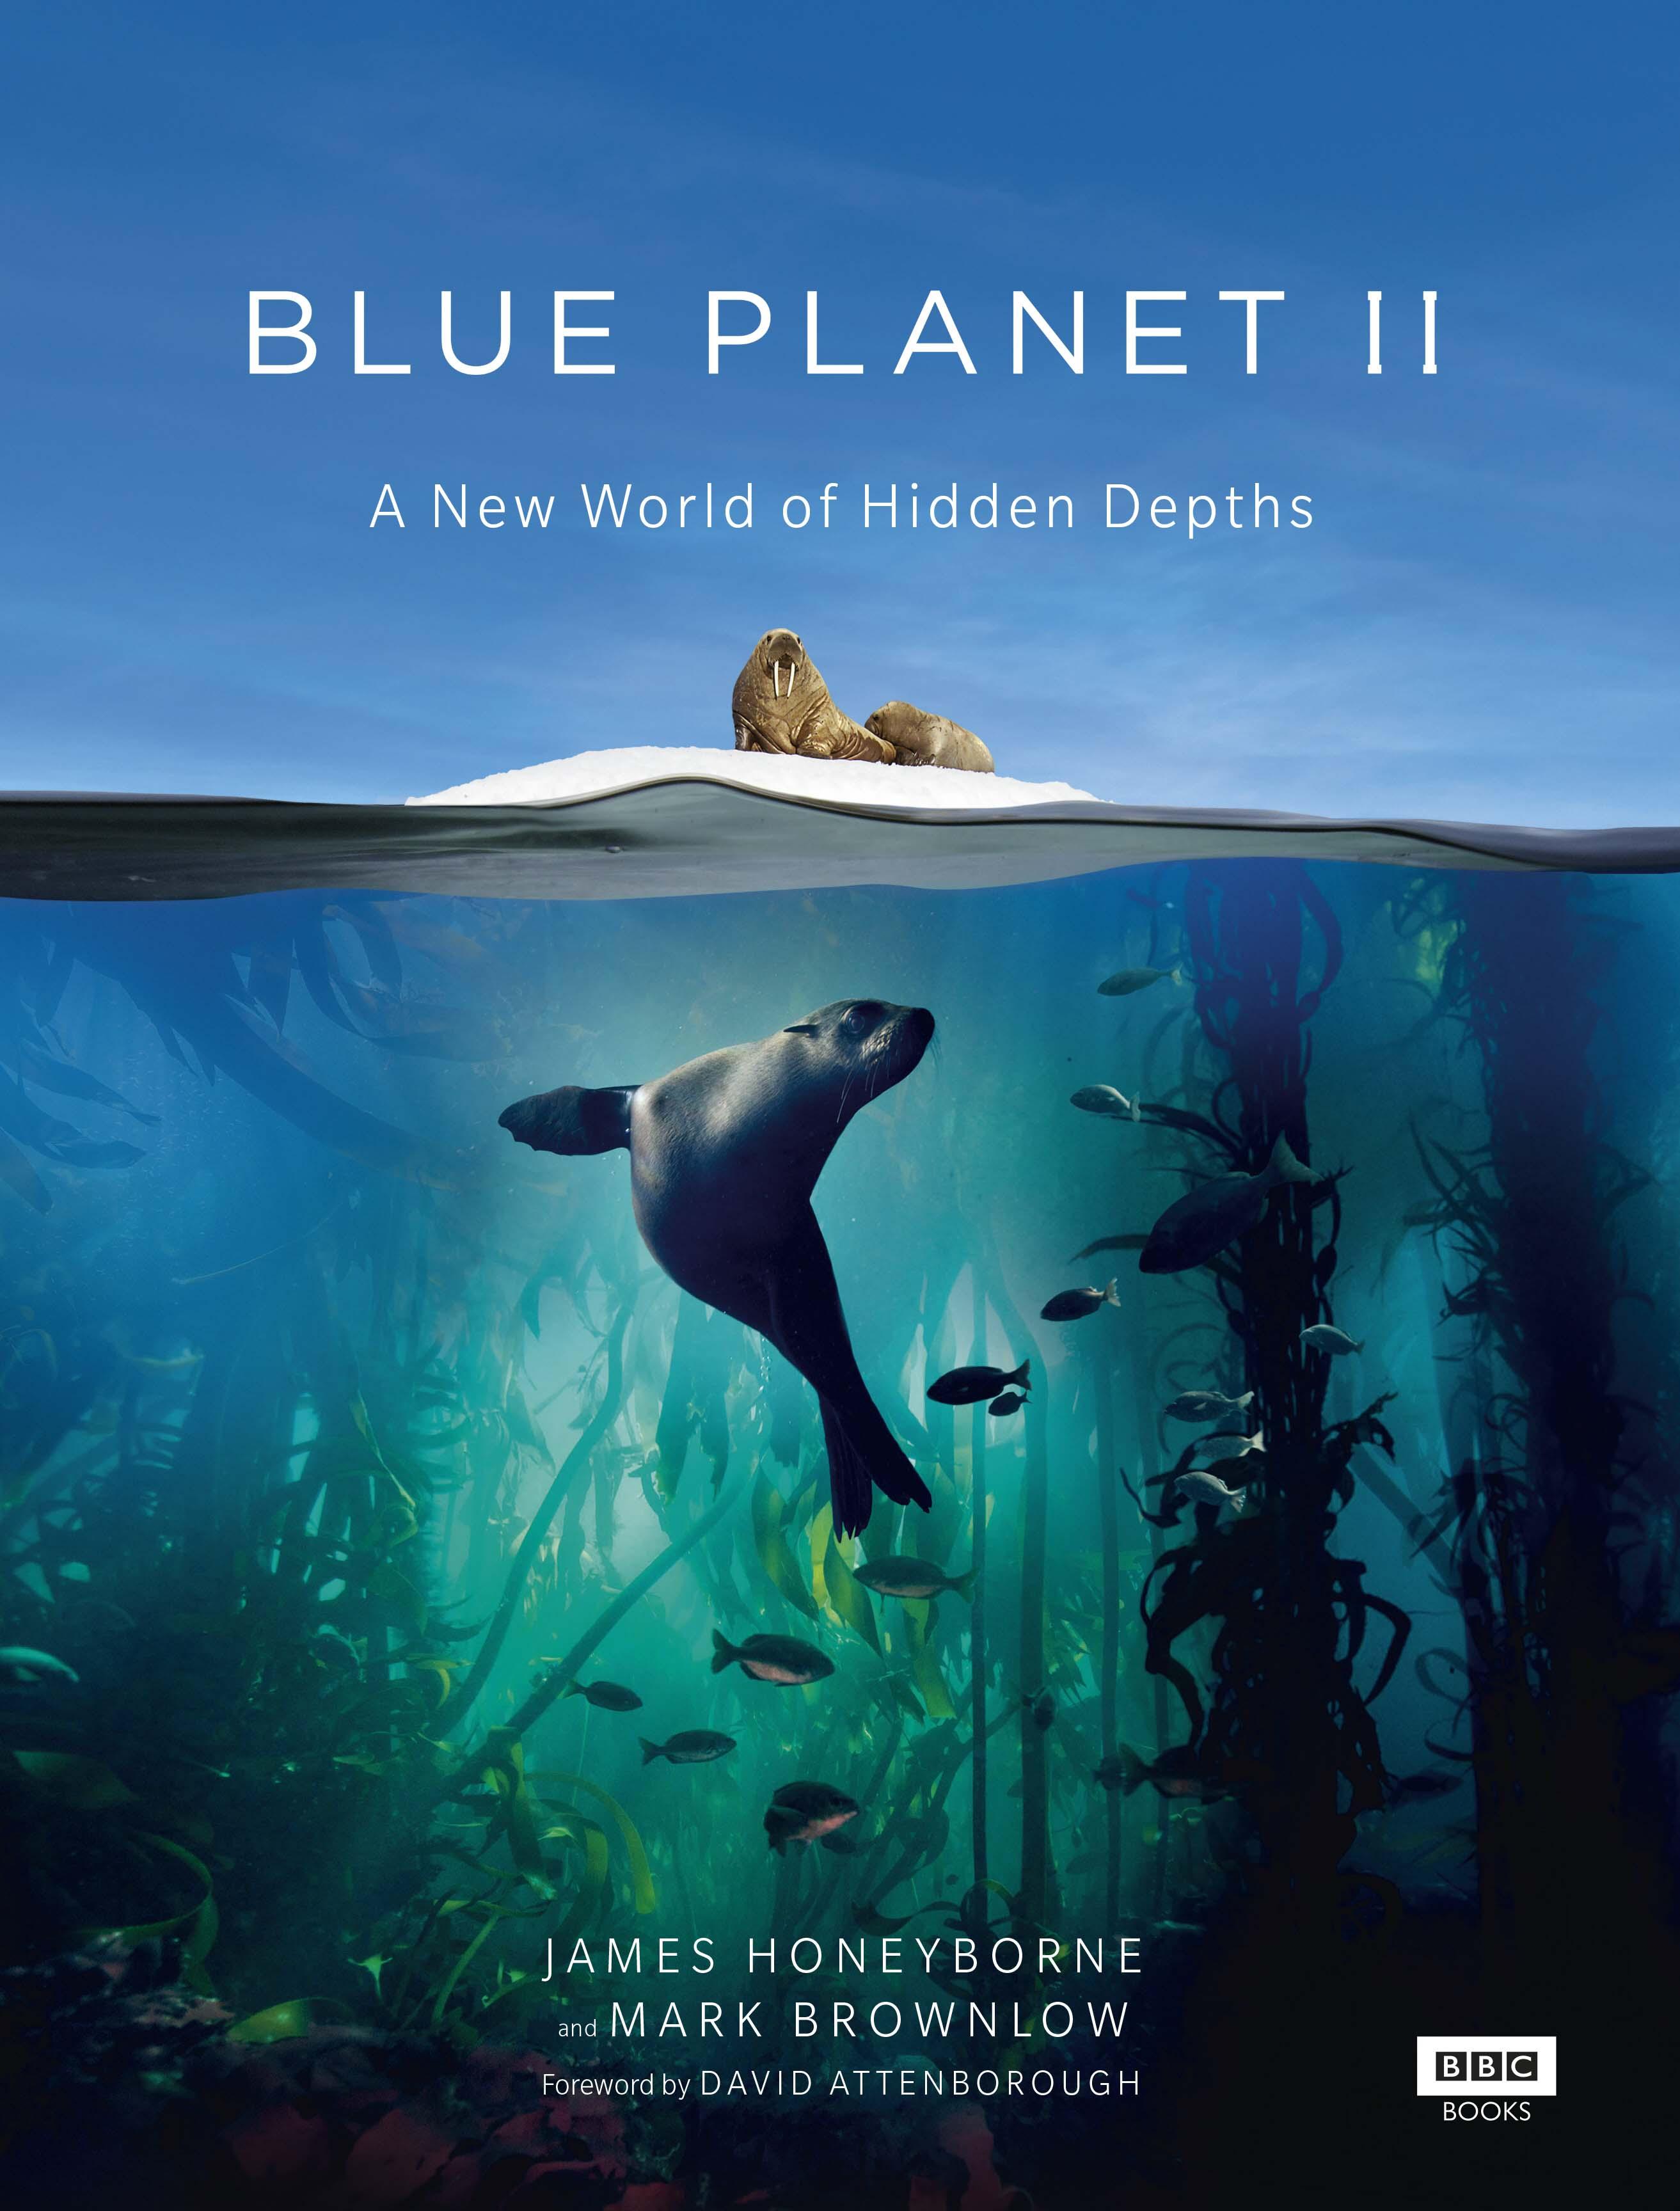 phim tài liệu Blue Planet II